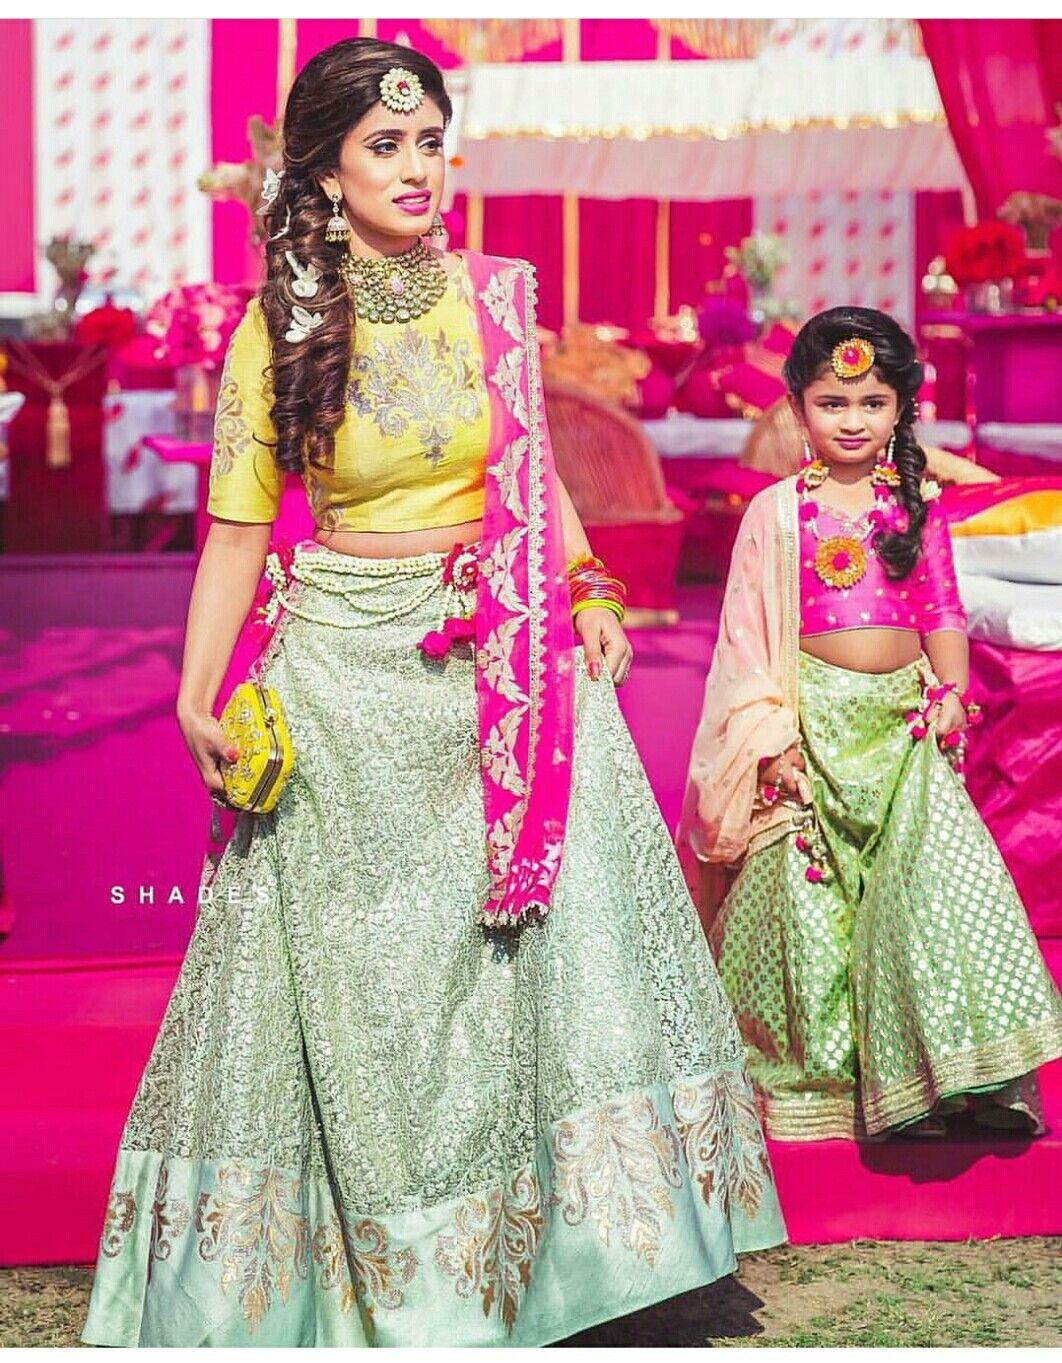 Pin de Sangeeta Vishwakarma en Wedding | Pinterest